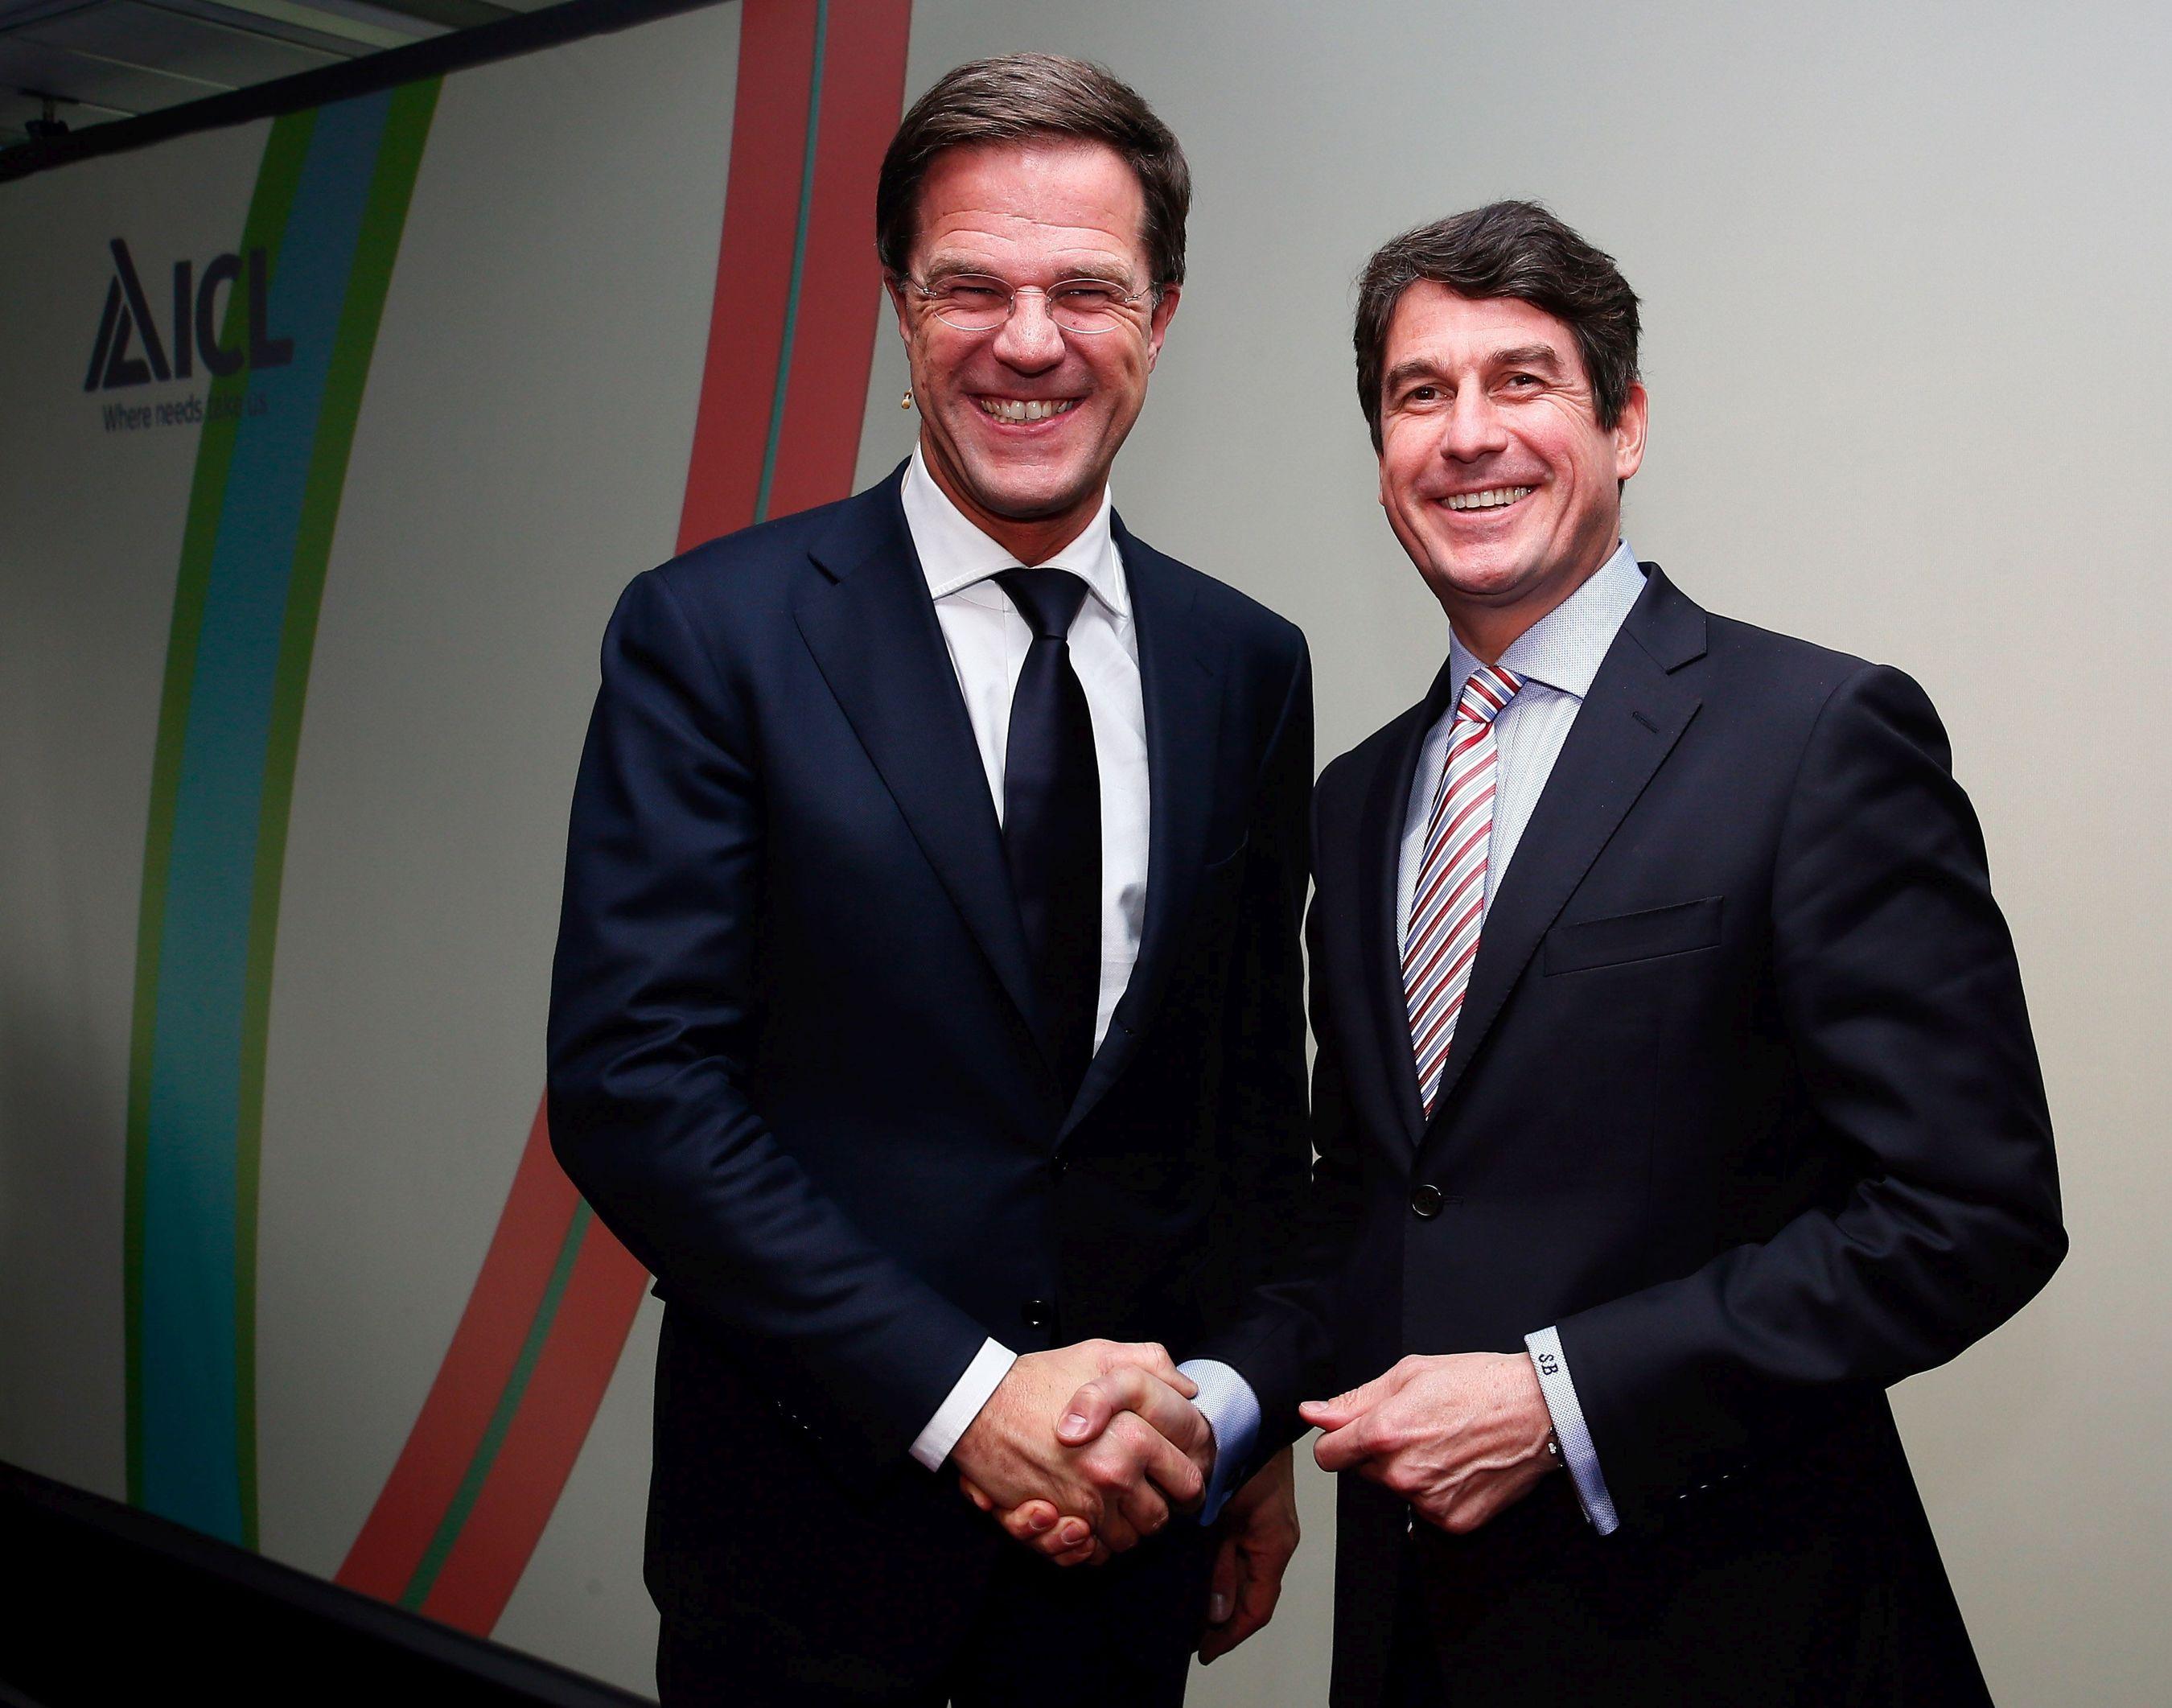 Dutch Prime Minister Mark Rutte, ICL President & CEO Stefan Borgas. Credit: Roy Borghouts (PRNewsFoto/ICL)